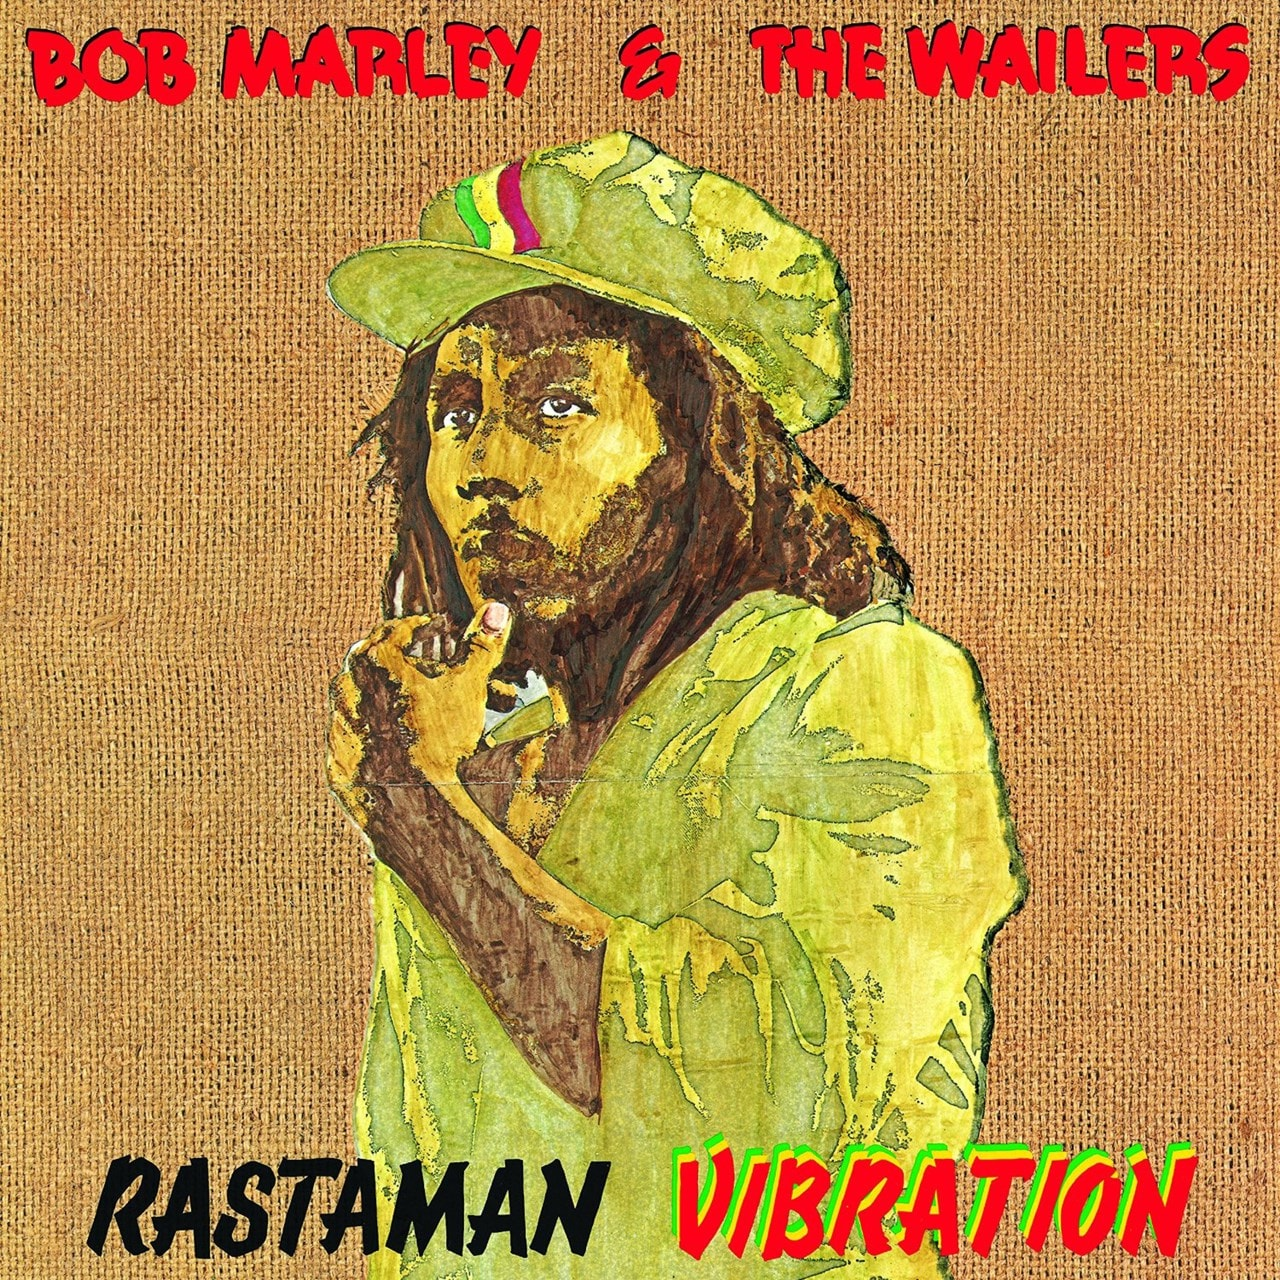 Rastaman Vibration - 1